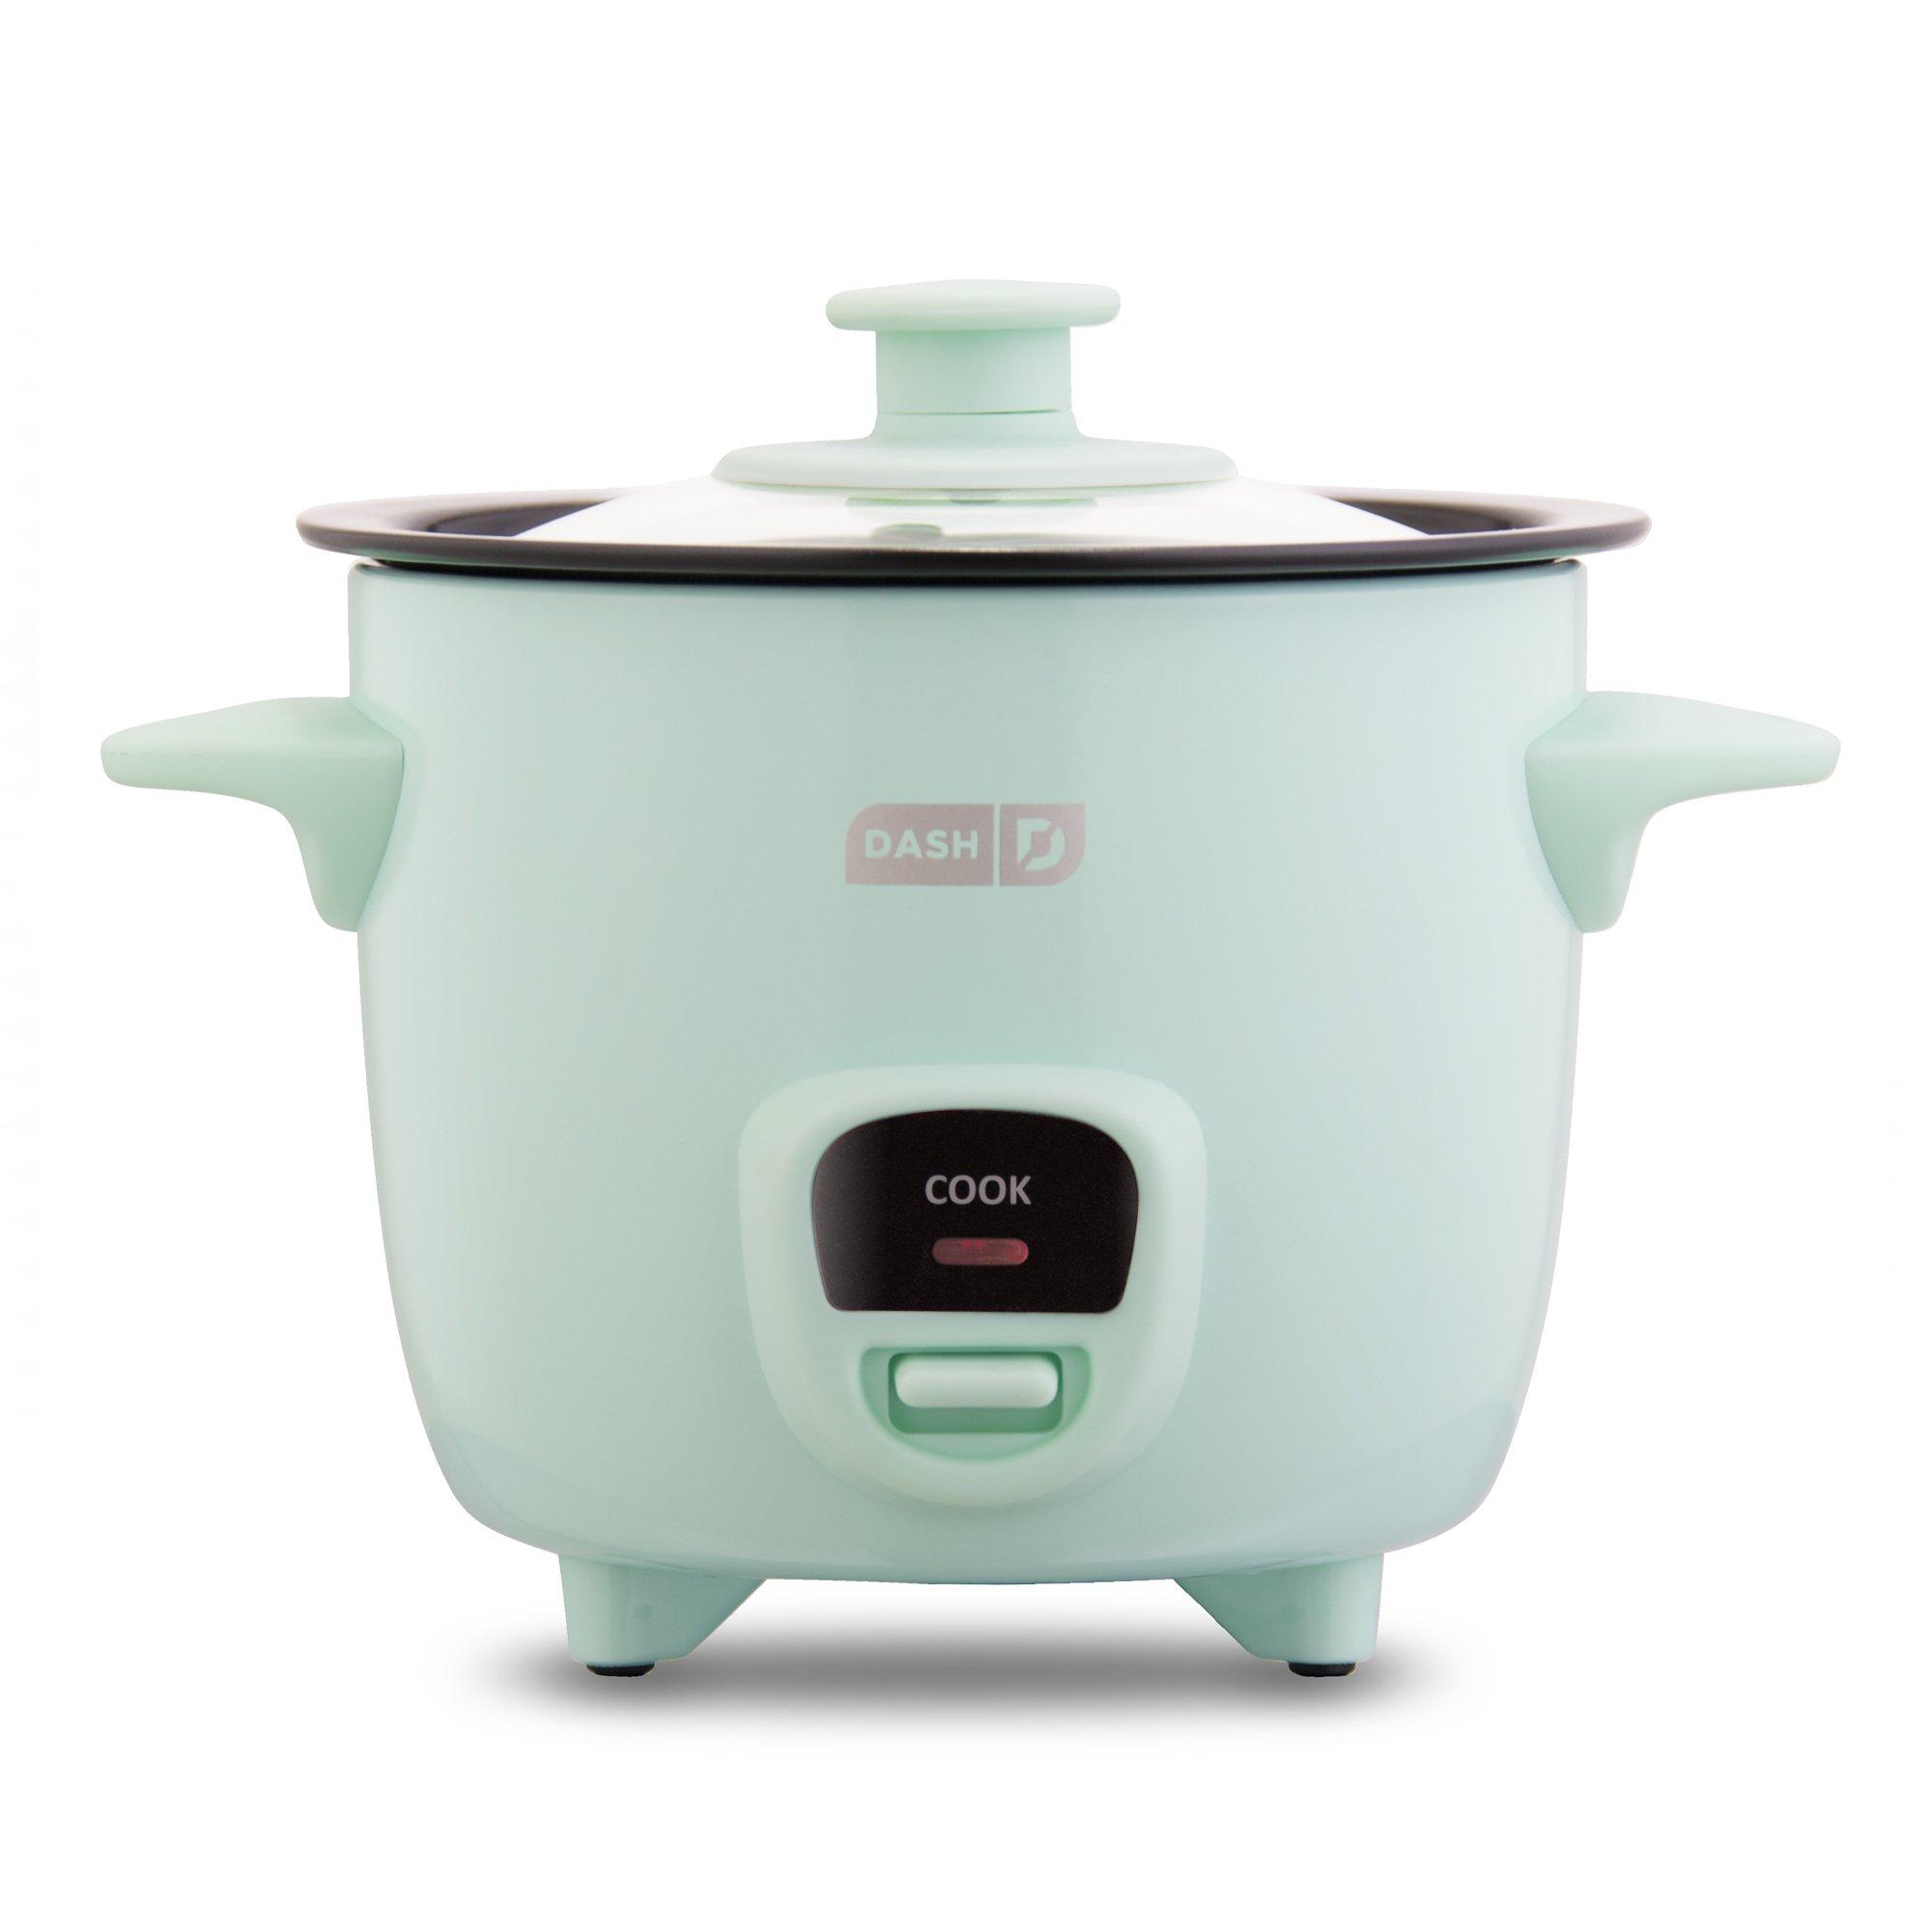 Dash DRCM100XXAQ04 Rice Cooker, Aqua